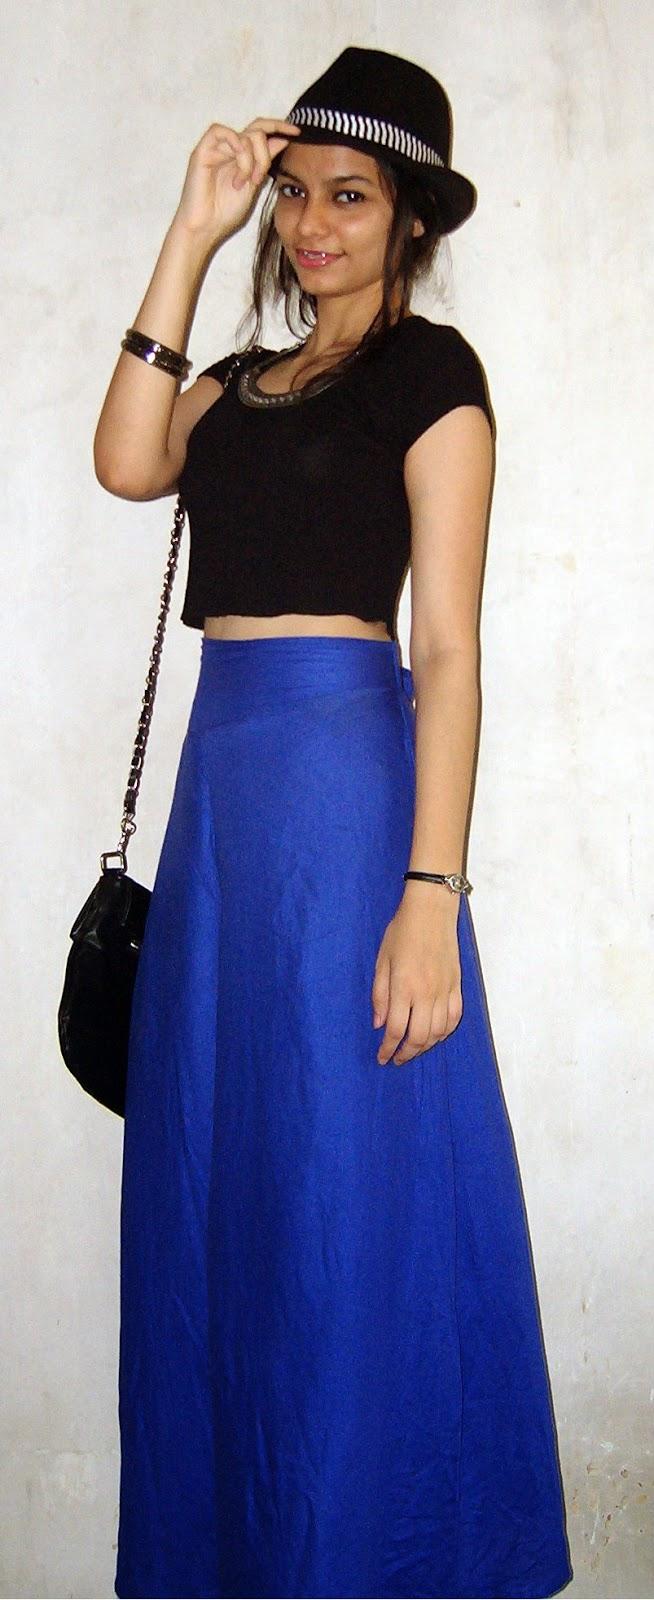 palazzo pants, croptop, black basic crop top, how to wear palazzo pants with croptops, short tops, mumbai fashion blogger, mumbai streetstyle